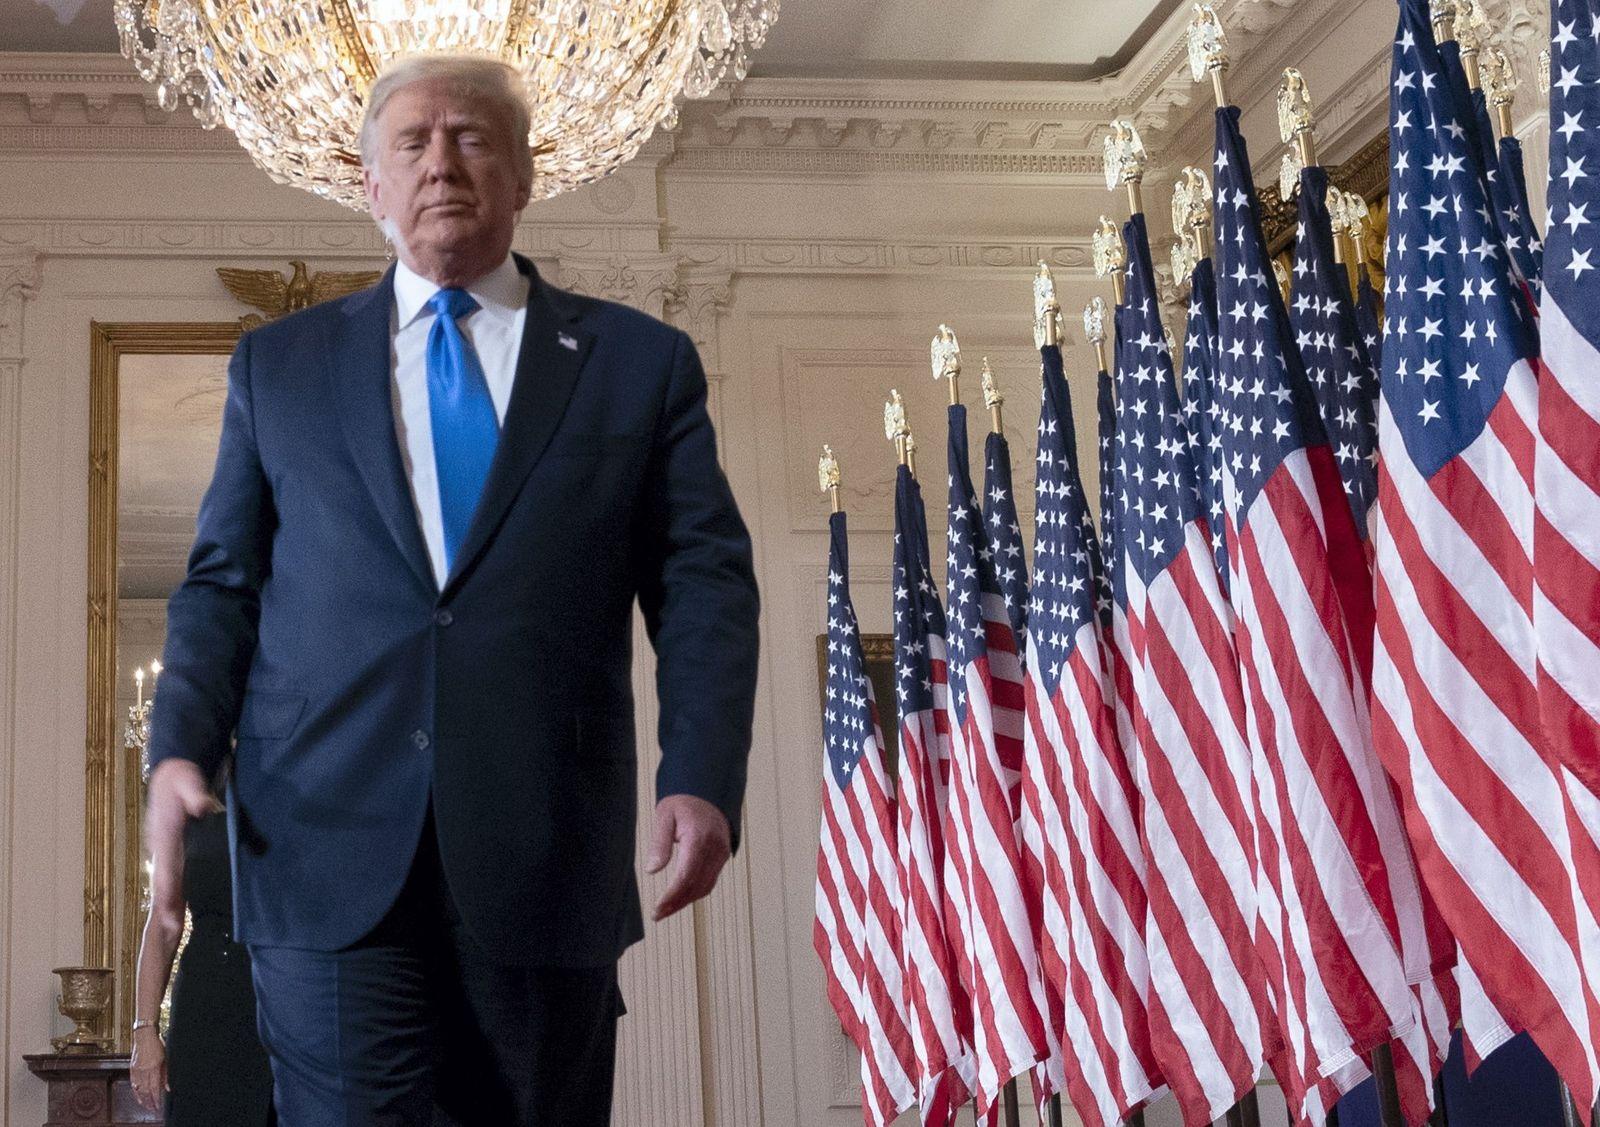 Trump speech on election night, Washington, USA - 04 Nov 2020